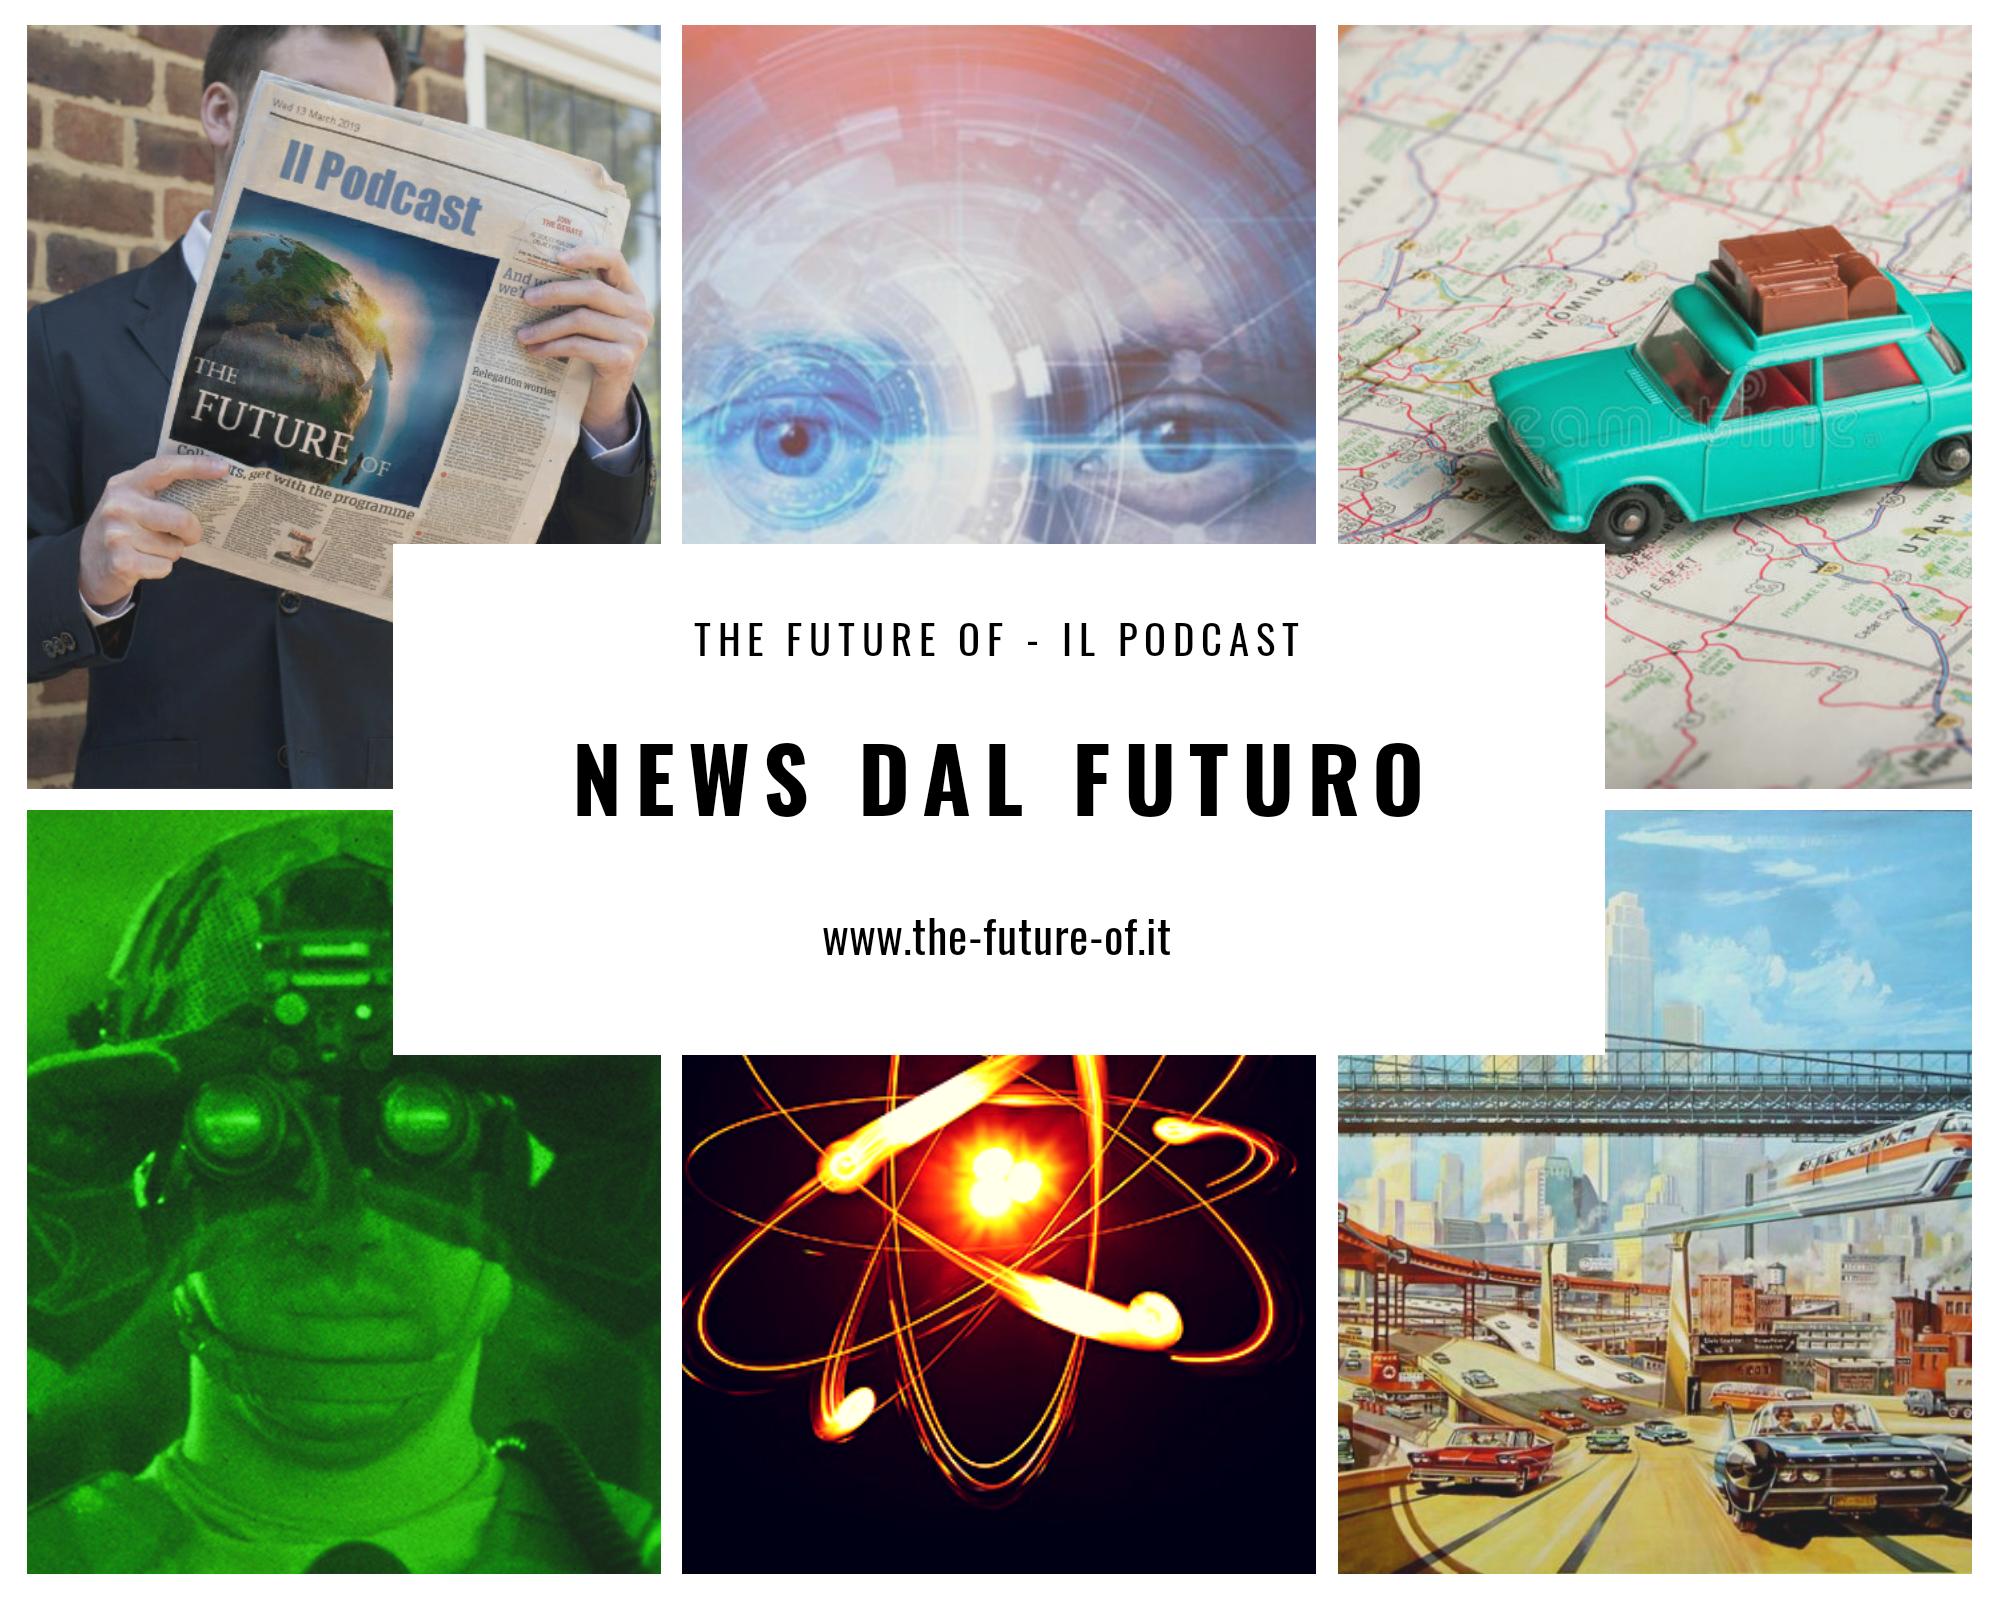 News dal futuro #66